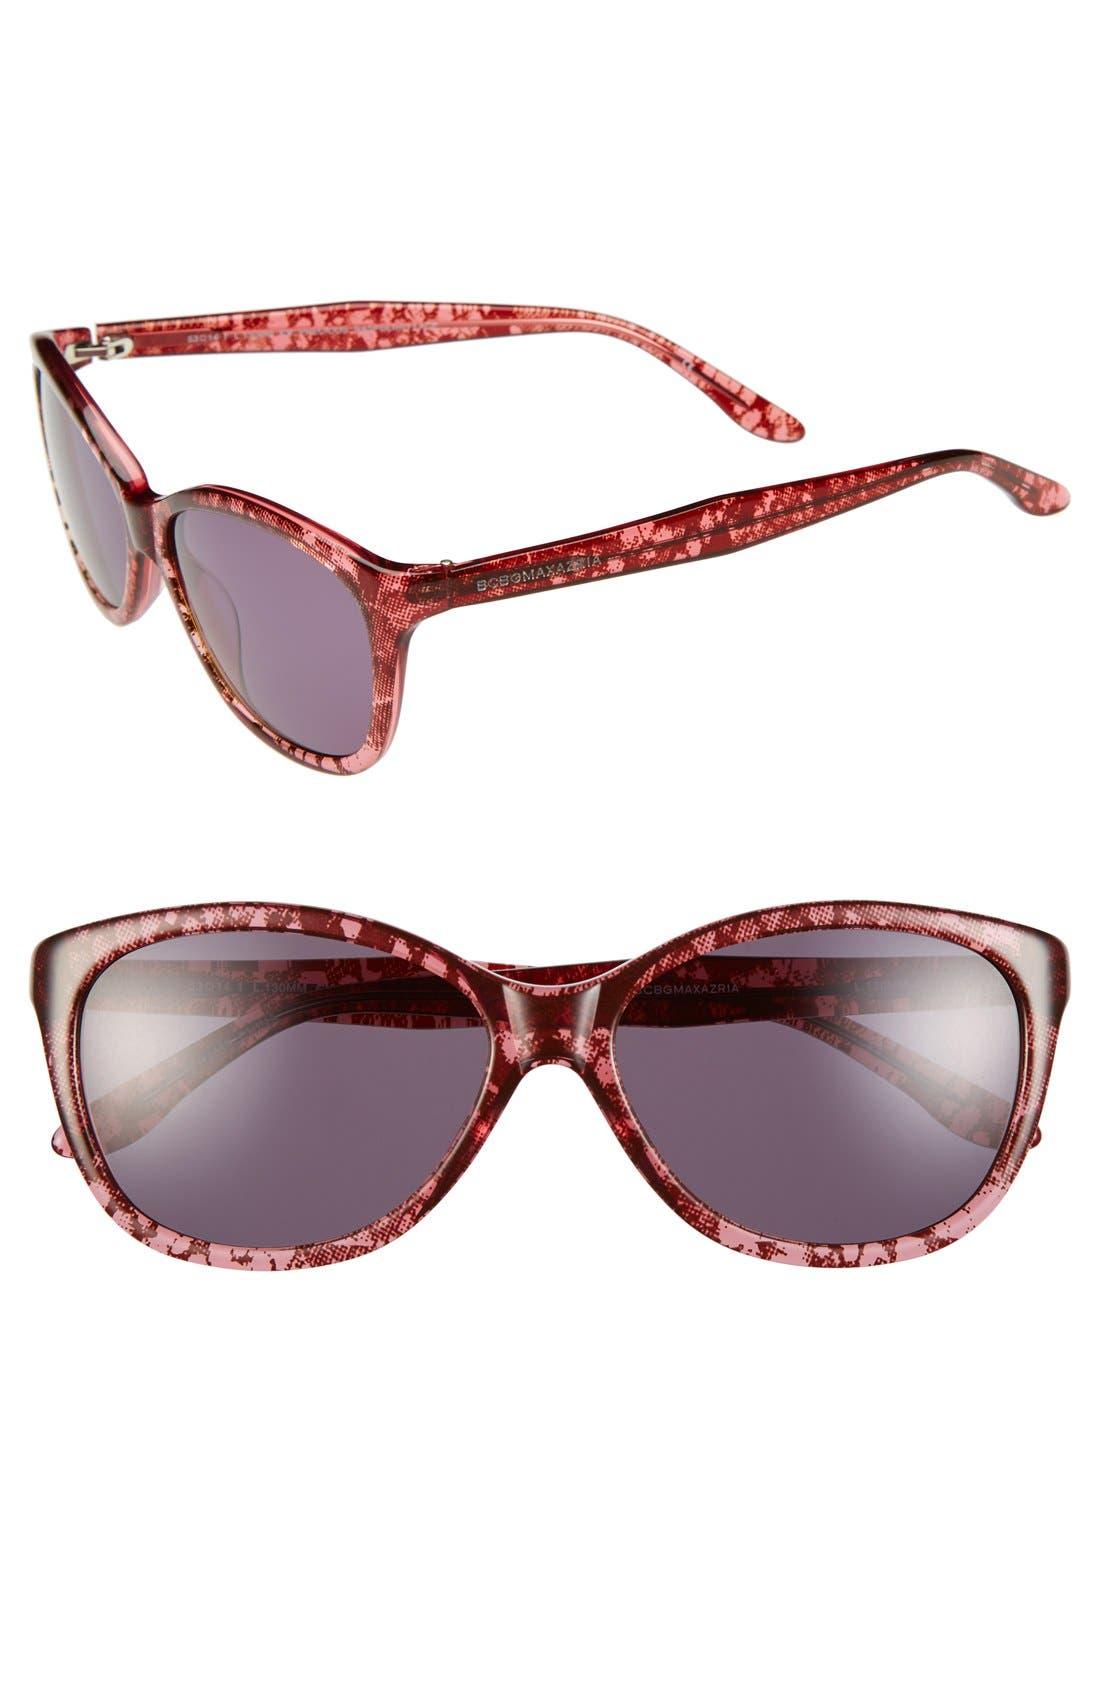 Main Image - BCBGMAXAZRIA 'Precious' 53mm Sunglasses